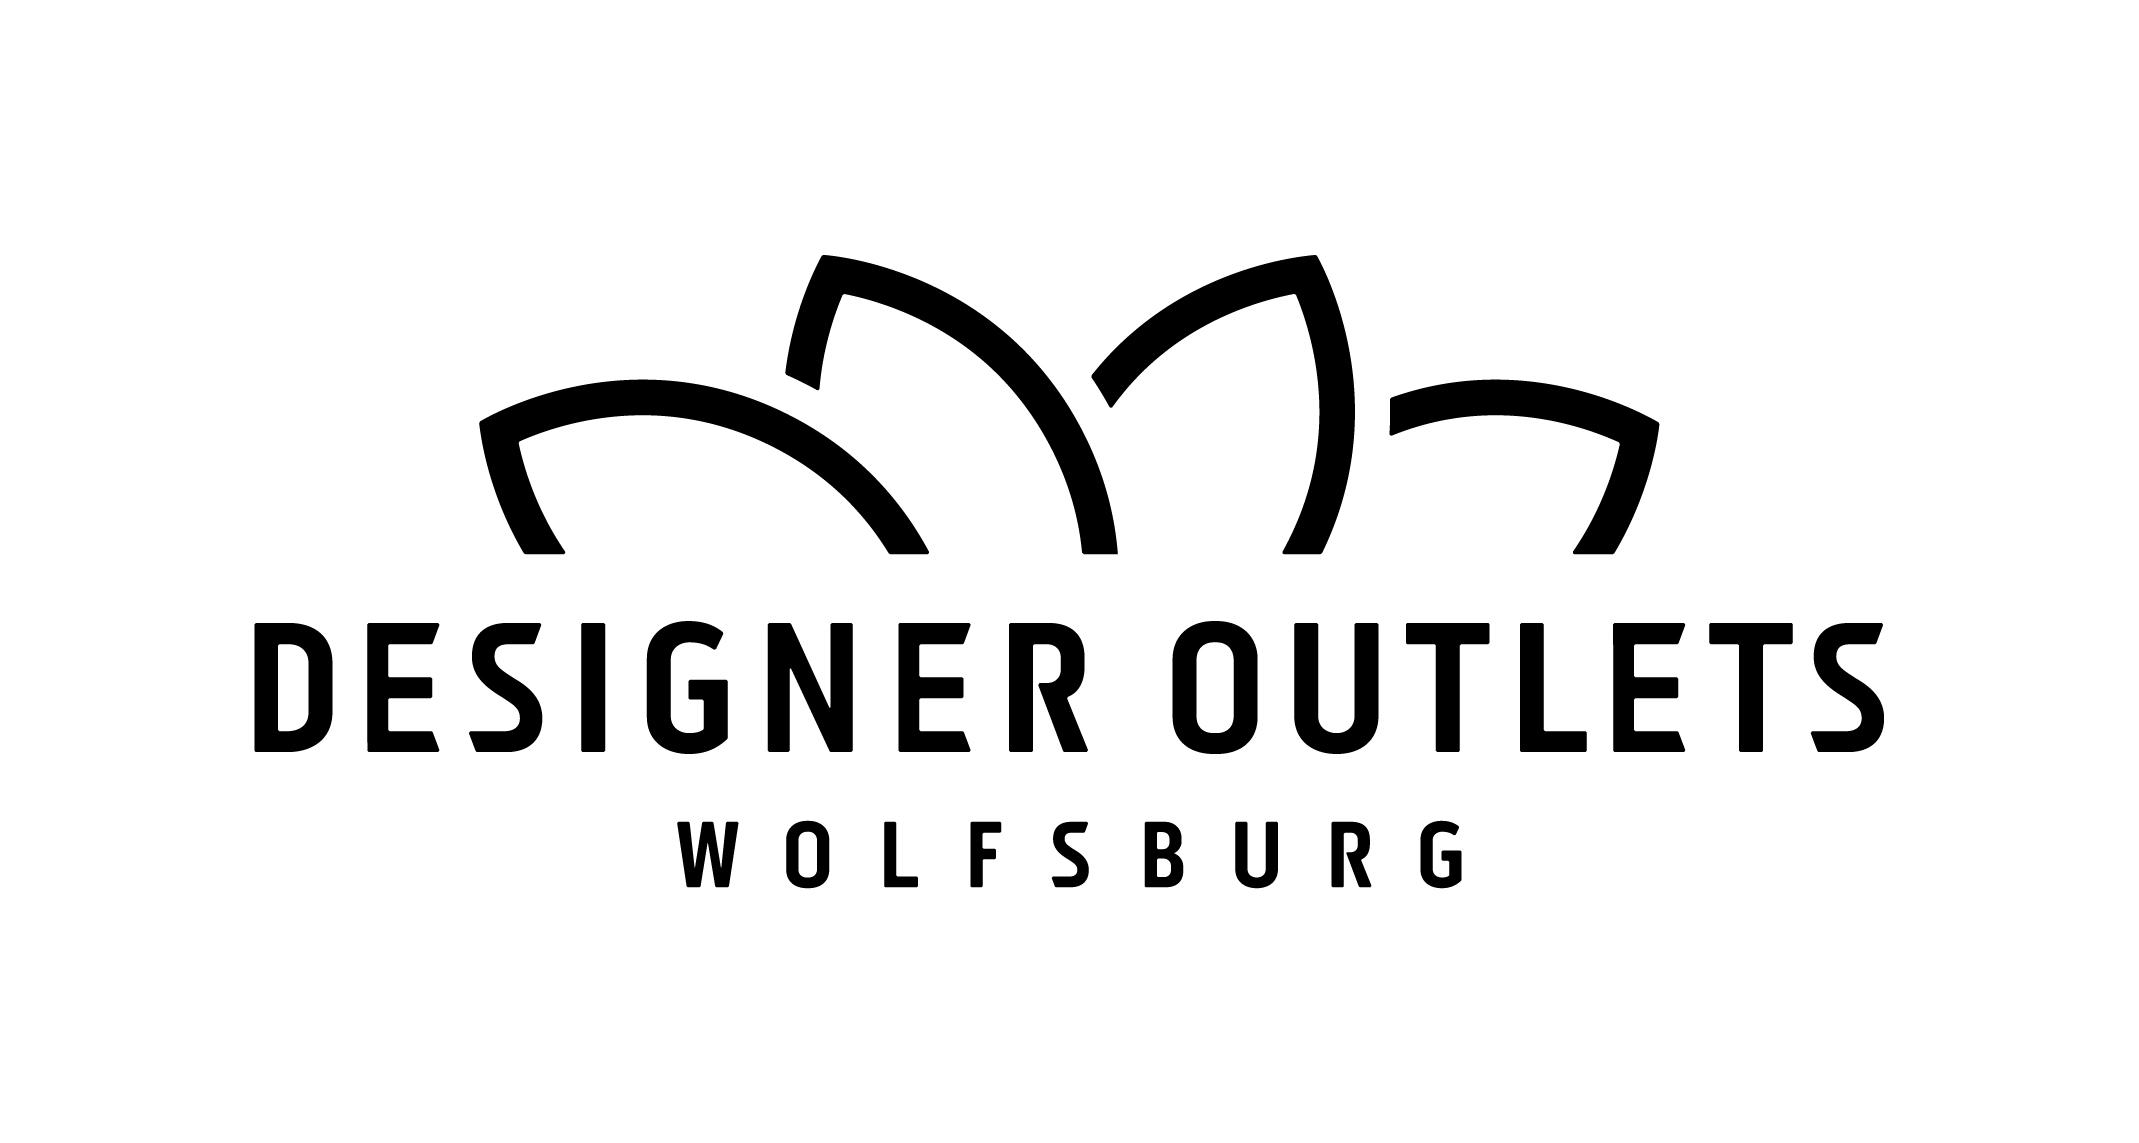 Designer Outslets Wolfsburg